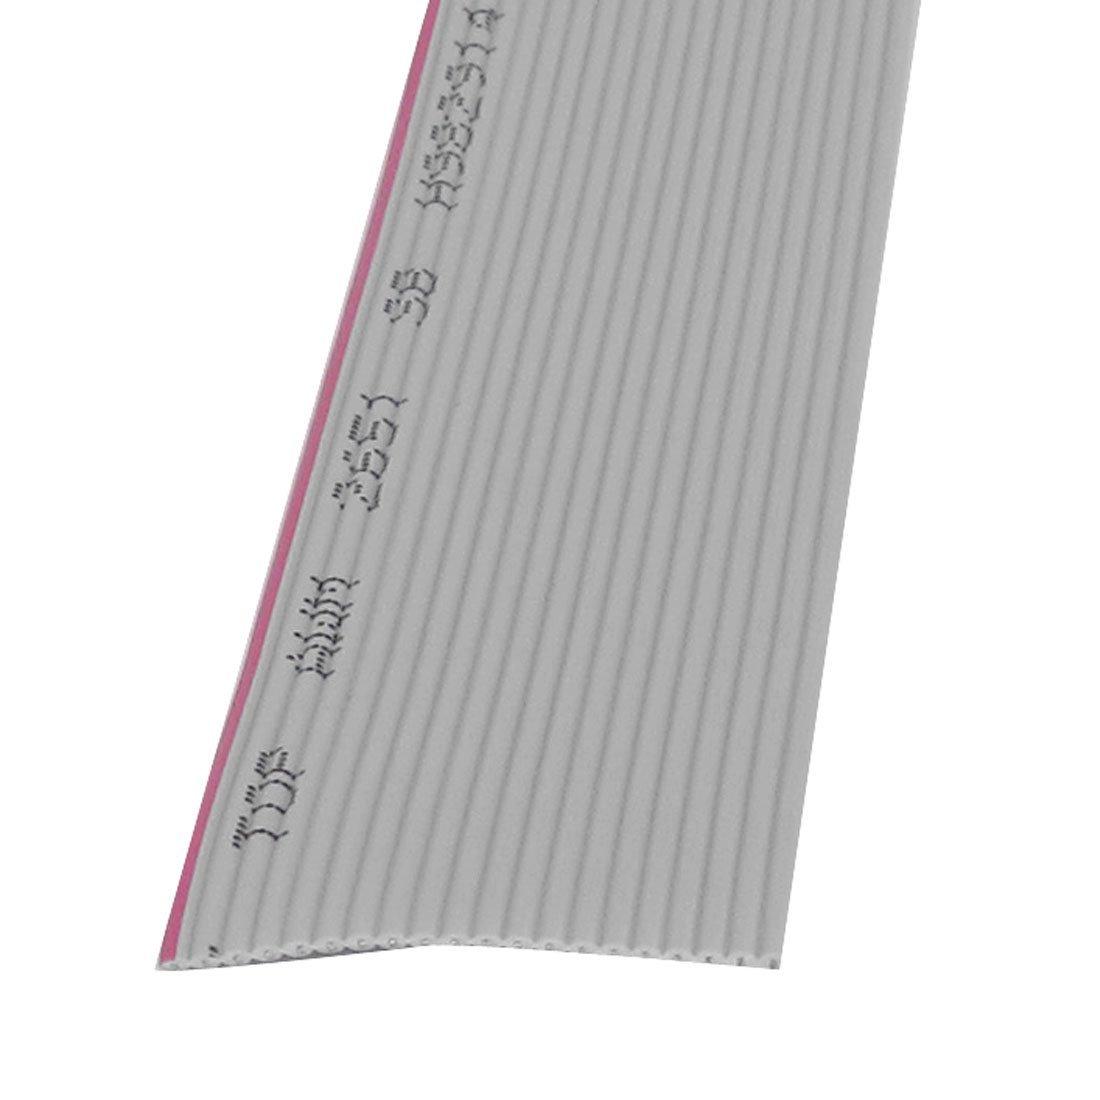 Cable de Cinta eDealMax ISP JTAG ARM IDC 20P Plana, 1,25 mm Espaciado, 1 Ancho, 5 m